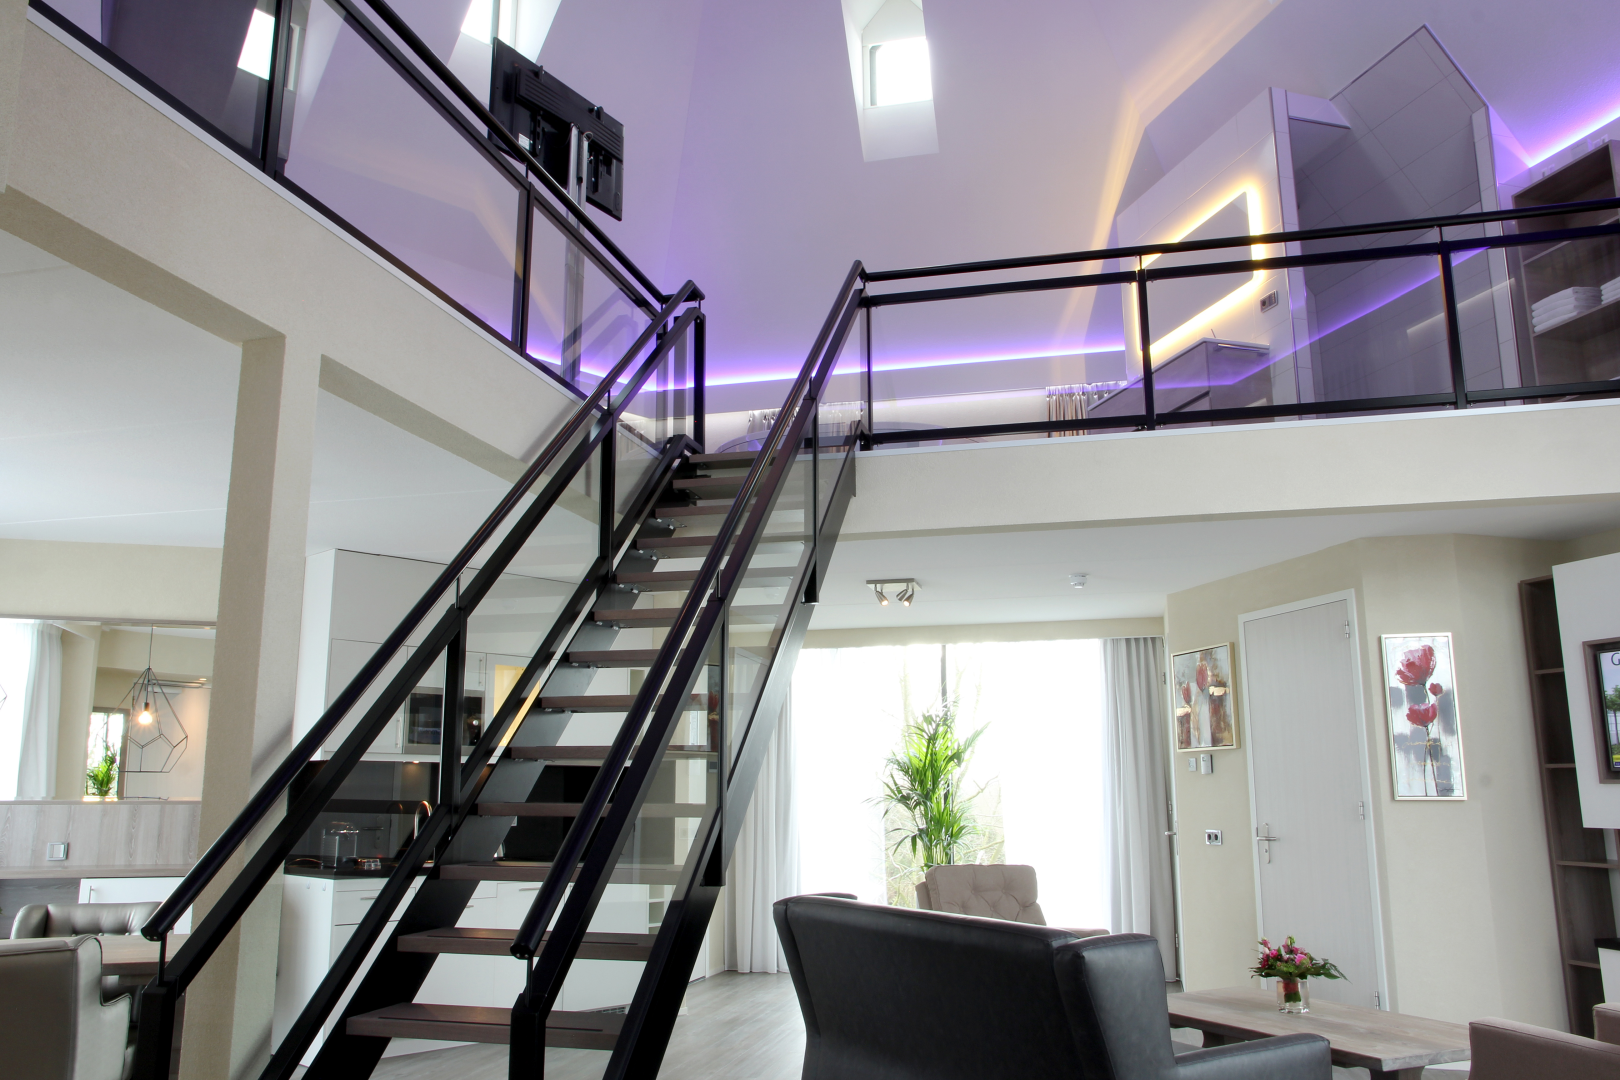 Marveld Tournament - Hotel Havezate Marveld - Stairs